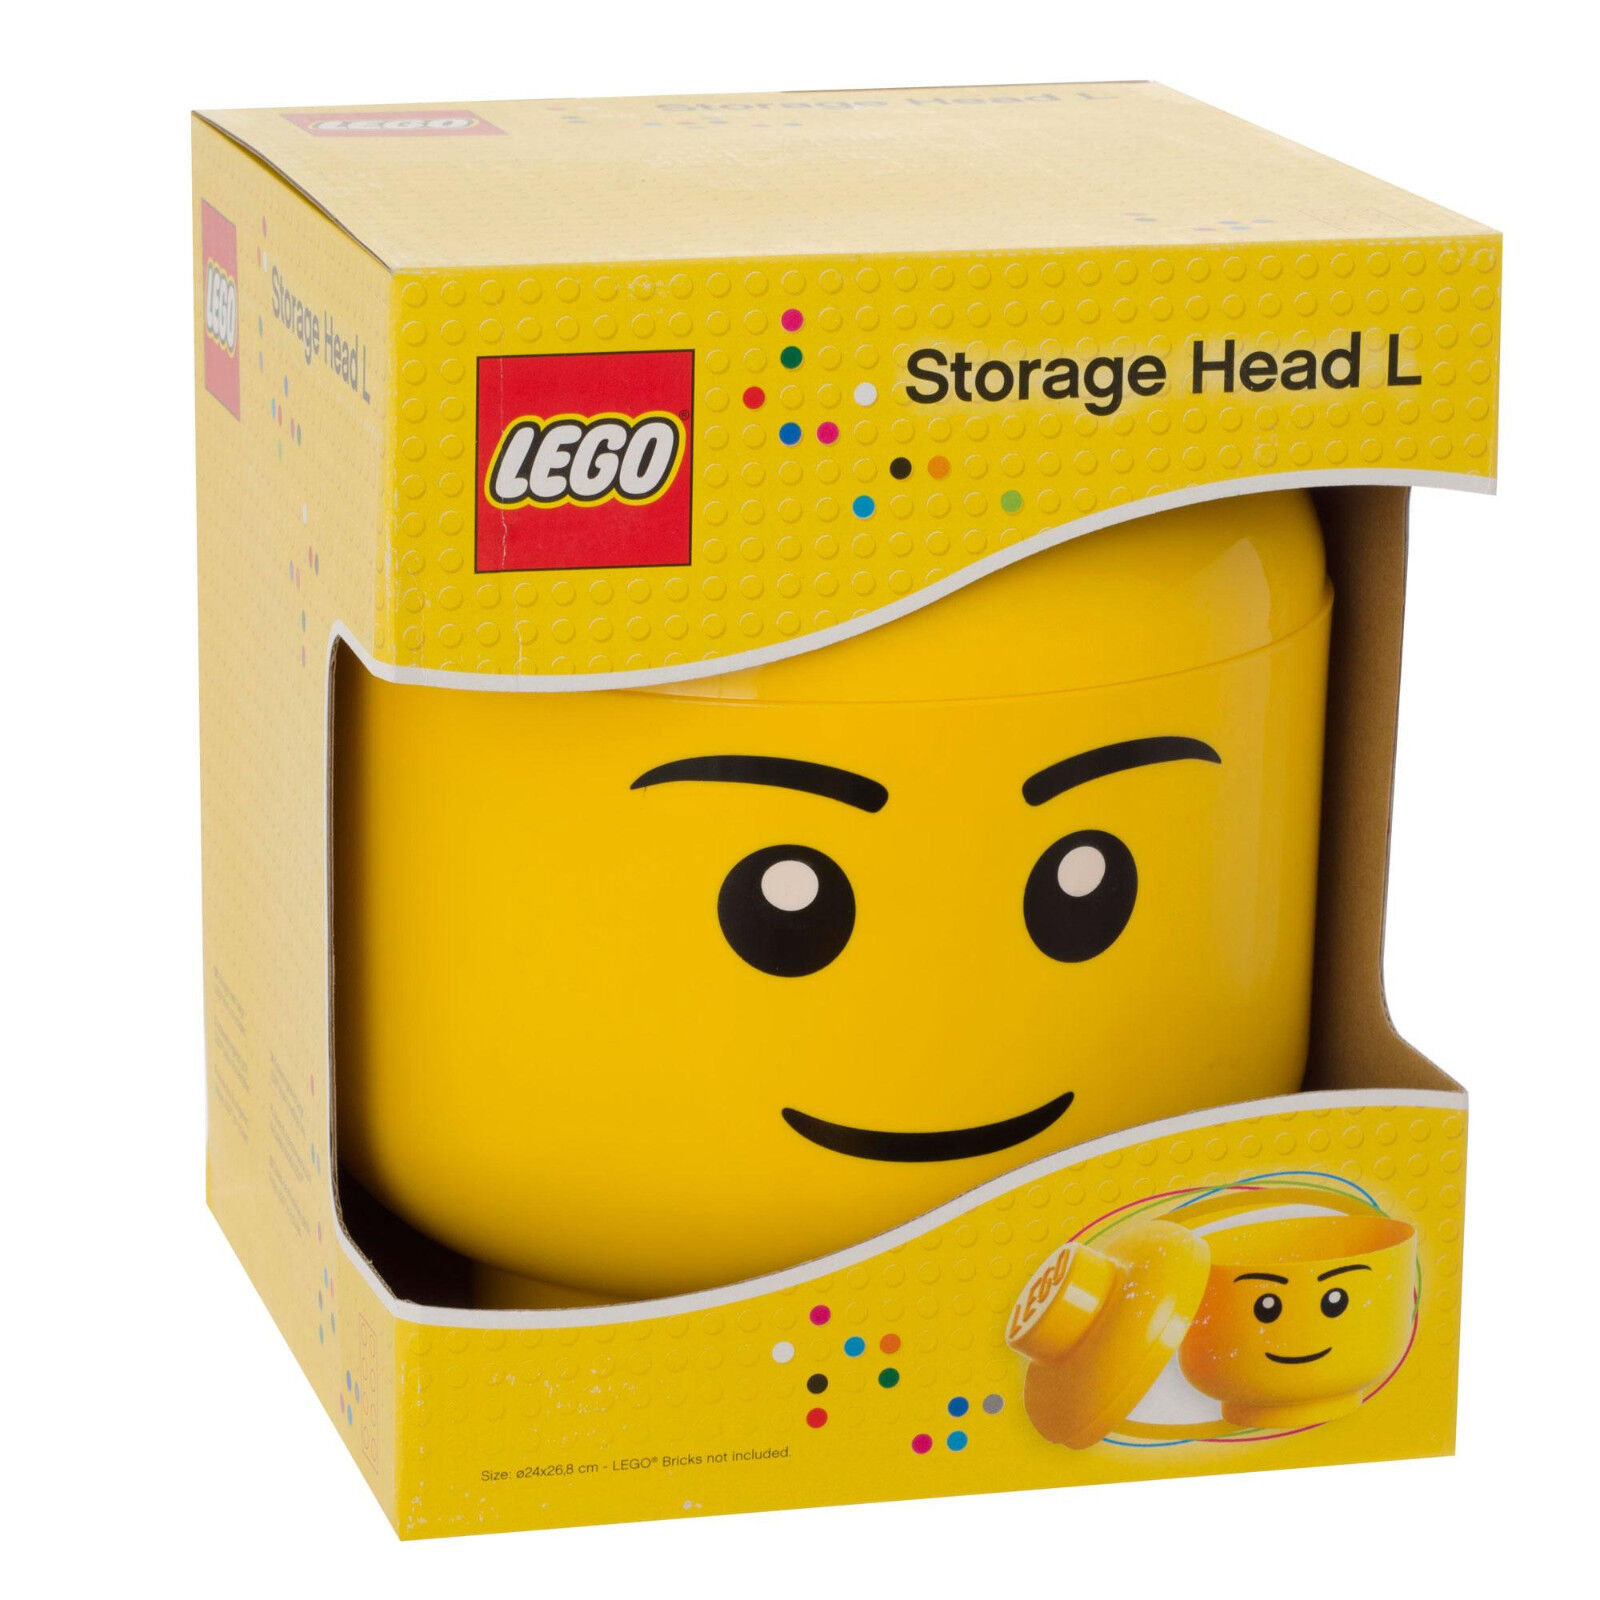 Lego Large Yellow Storage Minifigure Head Boy L RETIRED - Brand New & Sealed